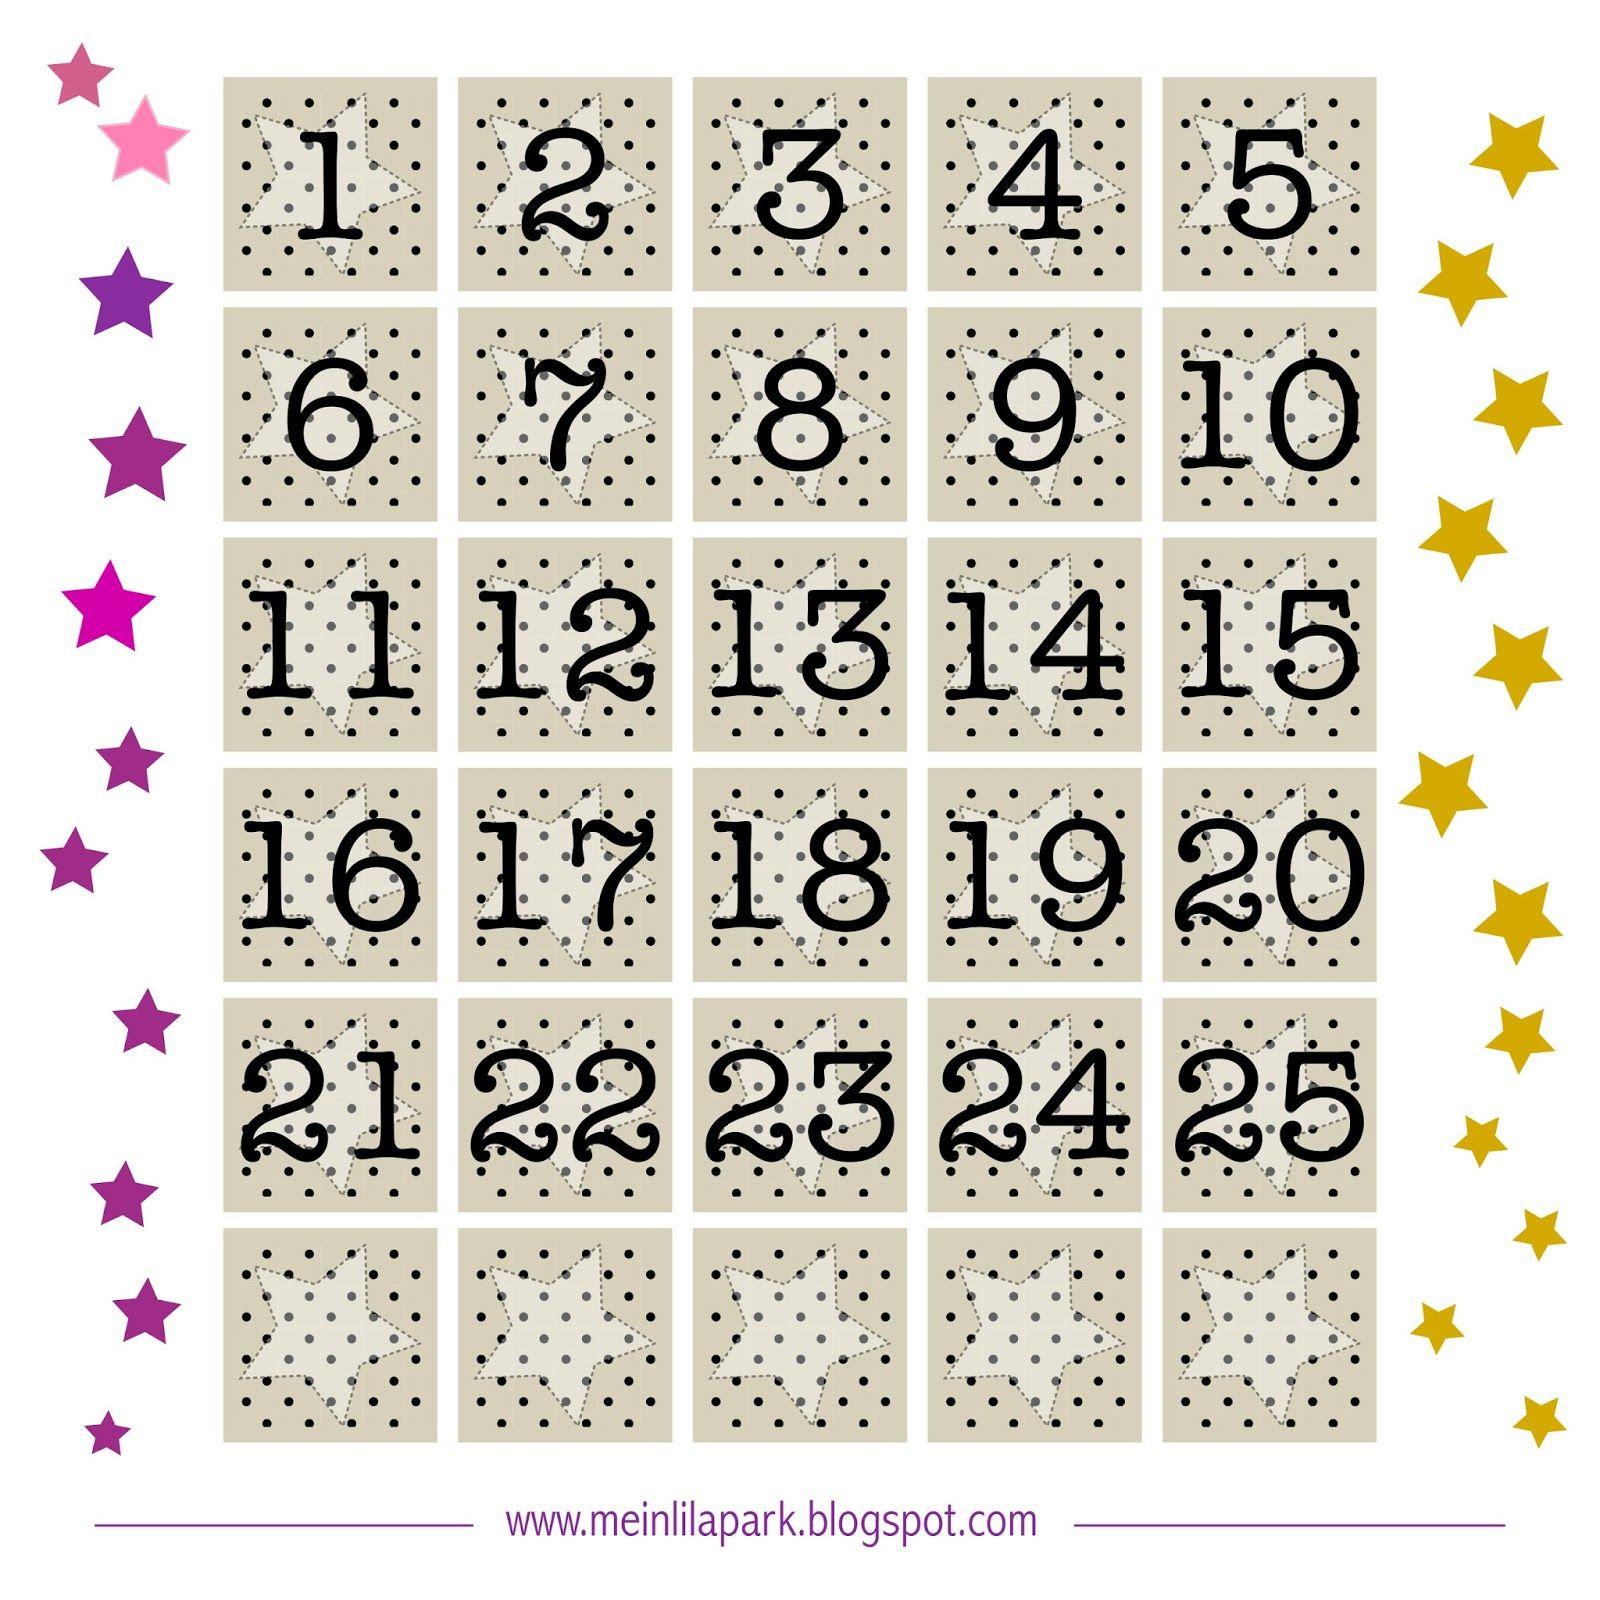 Free Printable Advent Calendar Tags Ausdruckbarer Adventkalender Freebie Free Printable Planner Stickers Printable Advent Calendar Mini Envelopes Template [ 1600 x 1600 Pixel ]